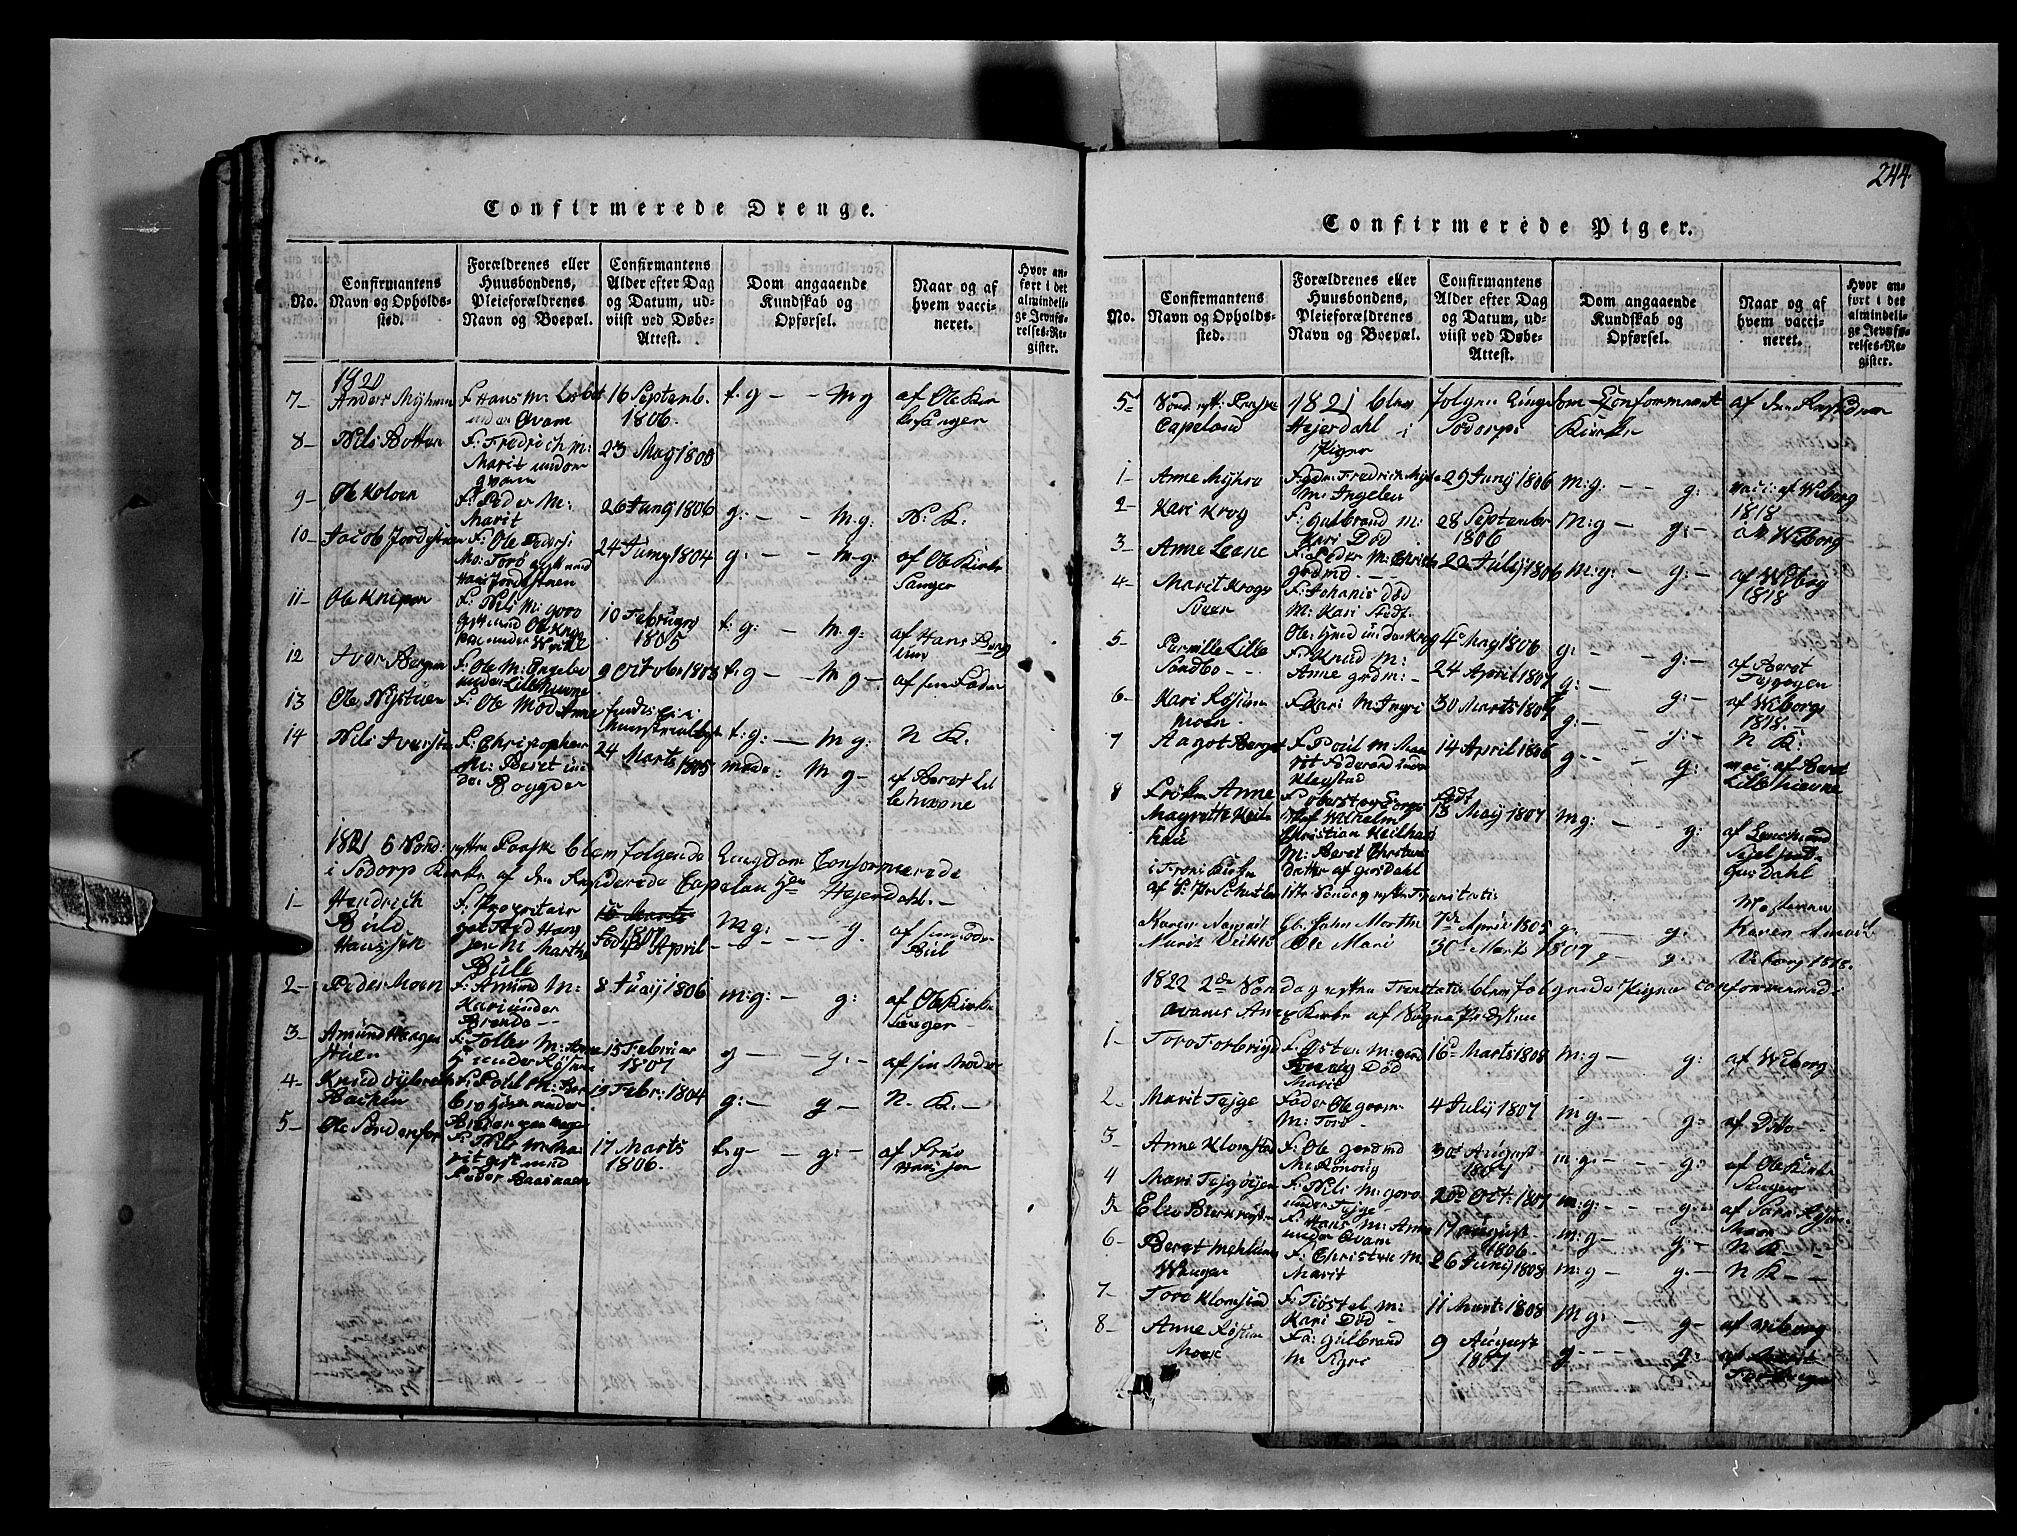 SAH, Fron prestekontor, H/Ha/Hab/L0002: Klokkerbok nr. 2, 1816-1850, s. 244